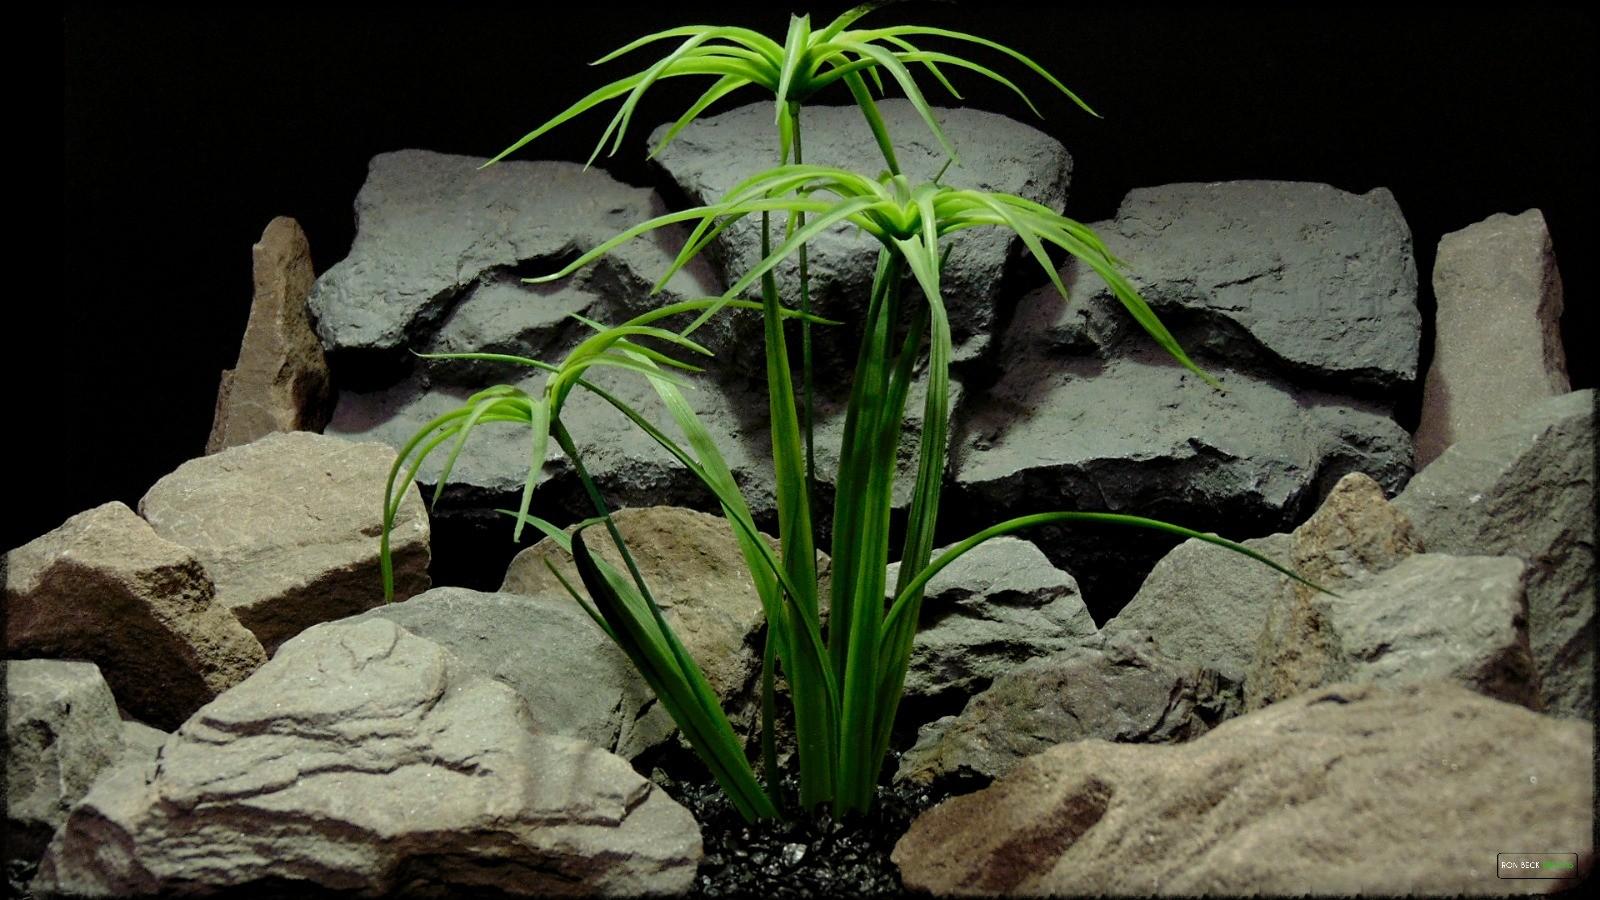 Artificial Plant - Cypress Grass - Reptile Habitat Plant - Ron Beck Designs prp395